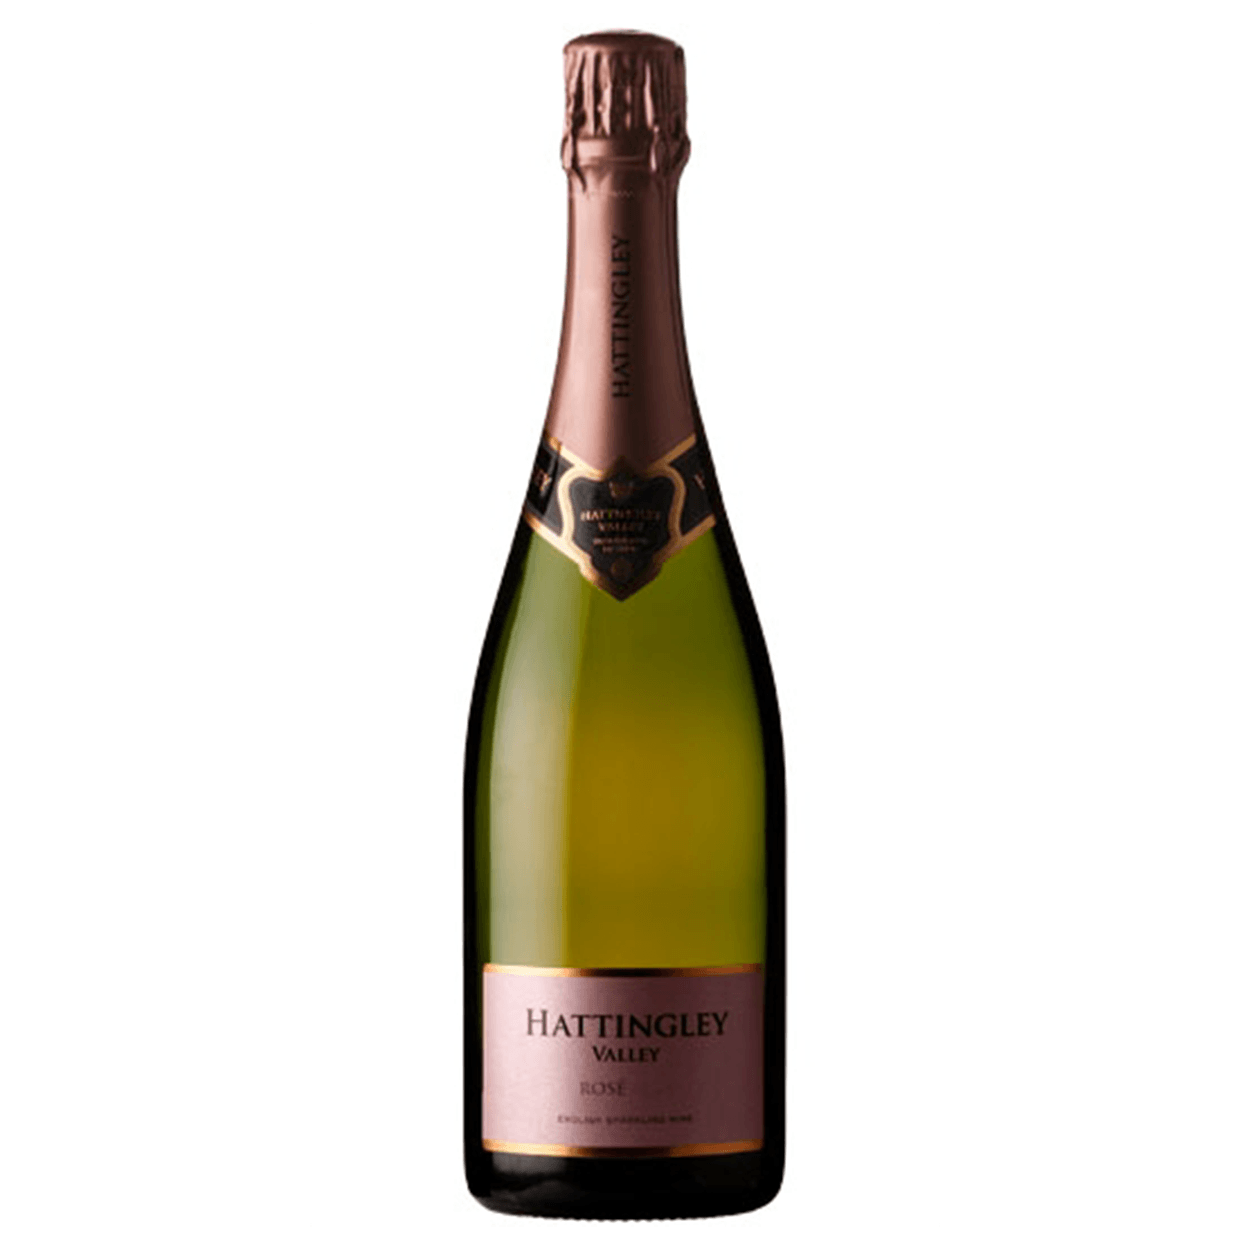 Hattingley Valley Rosé 2014 bottle shot